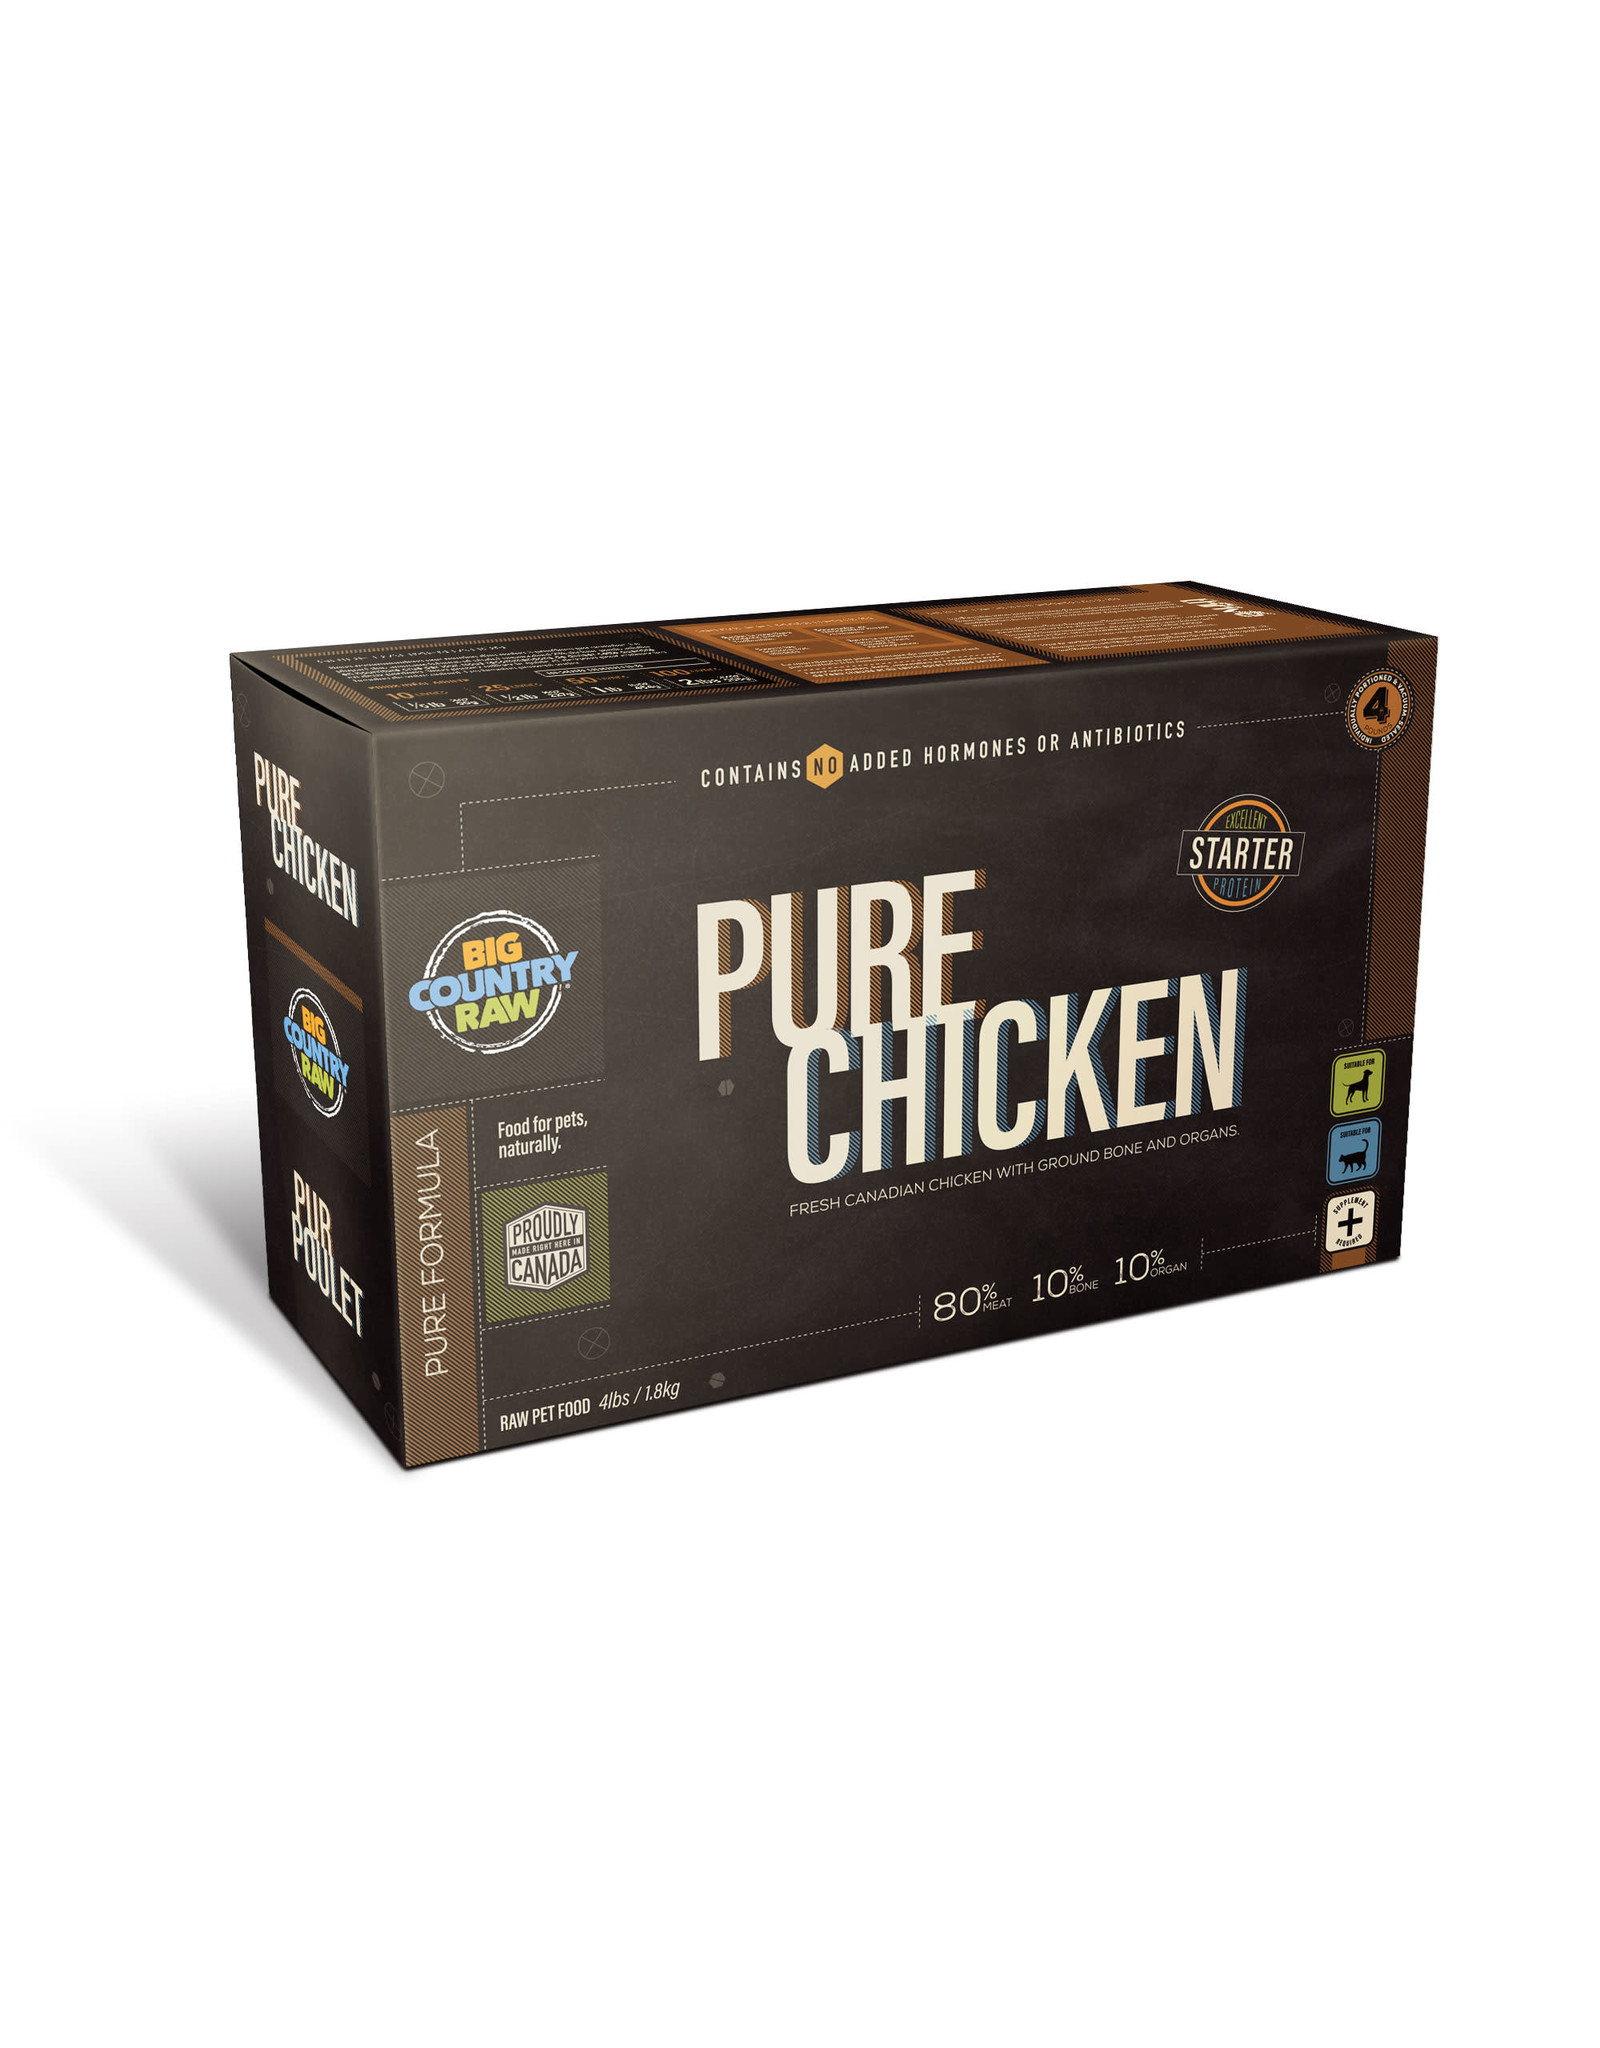 Big Country Raw BCR CARTON - 4x1lb - Pure Chicken